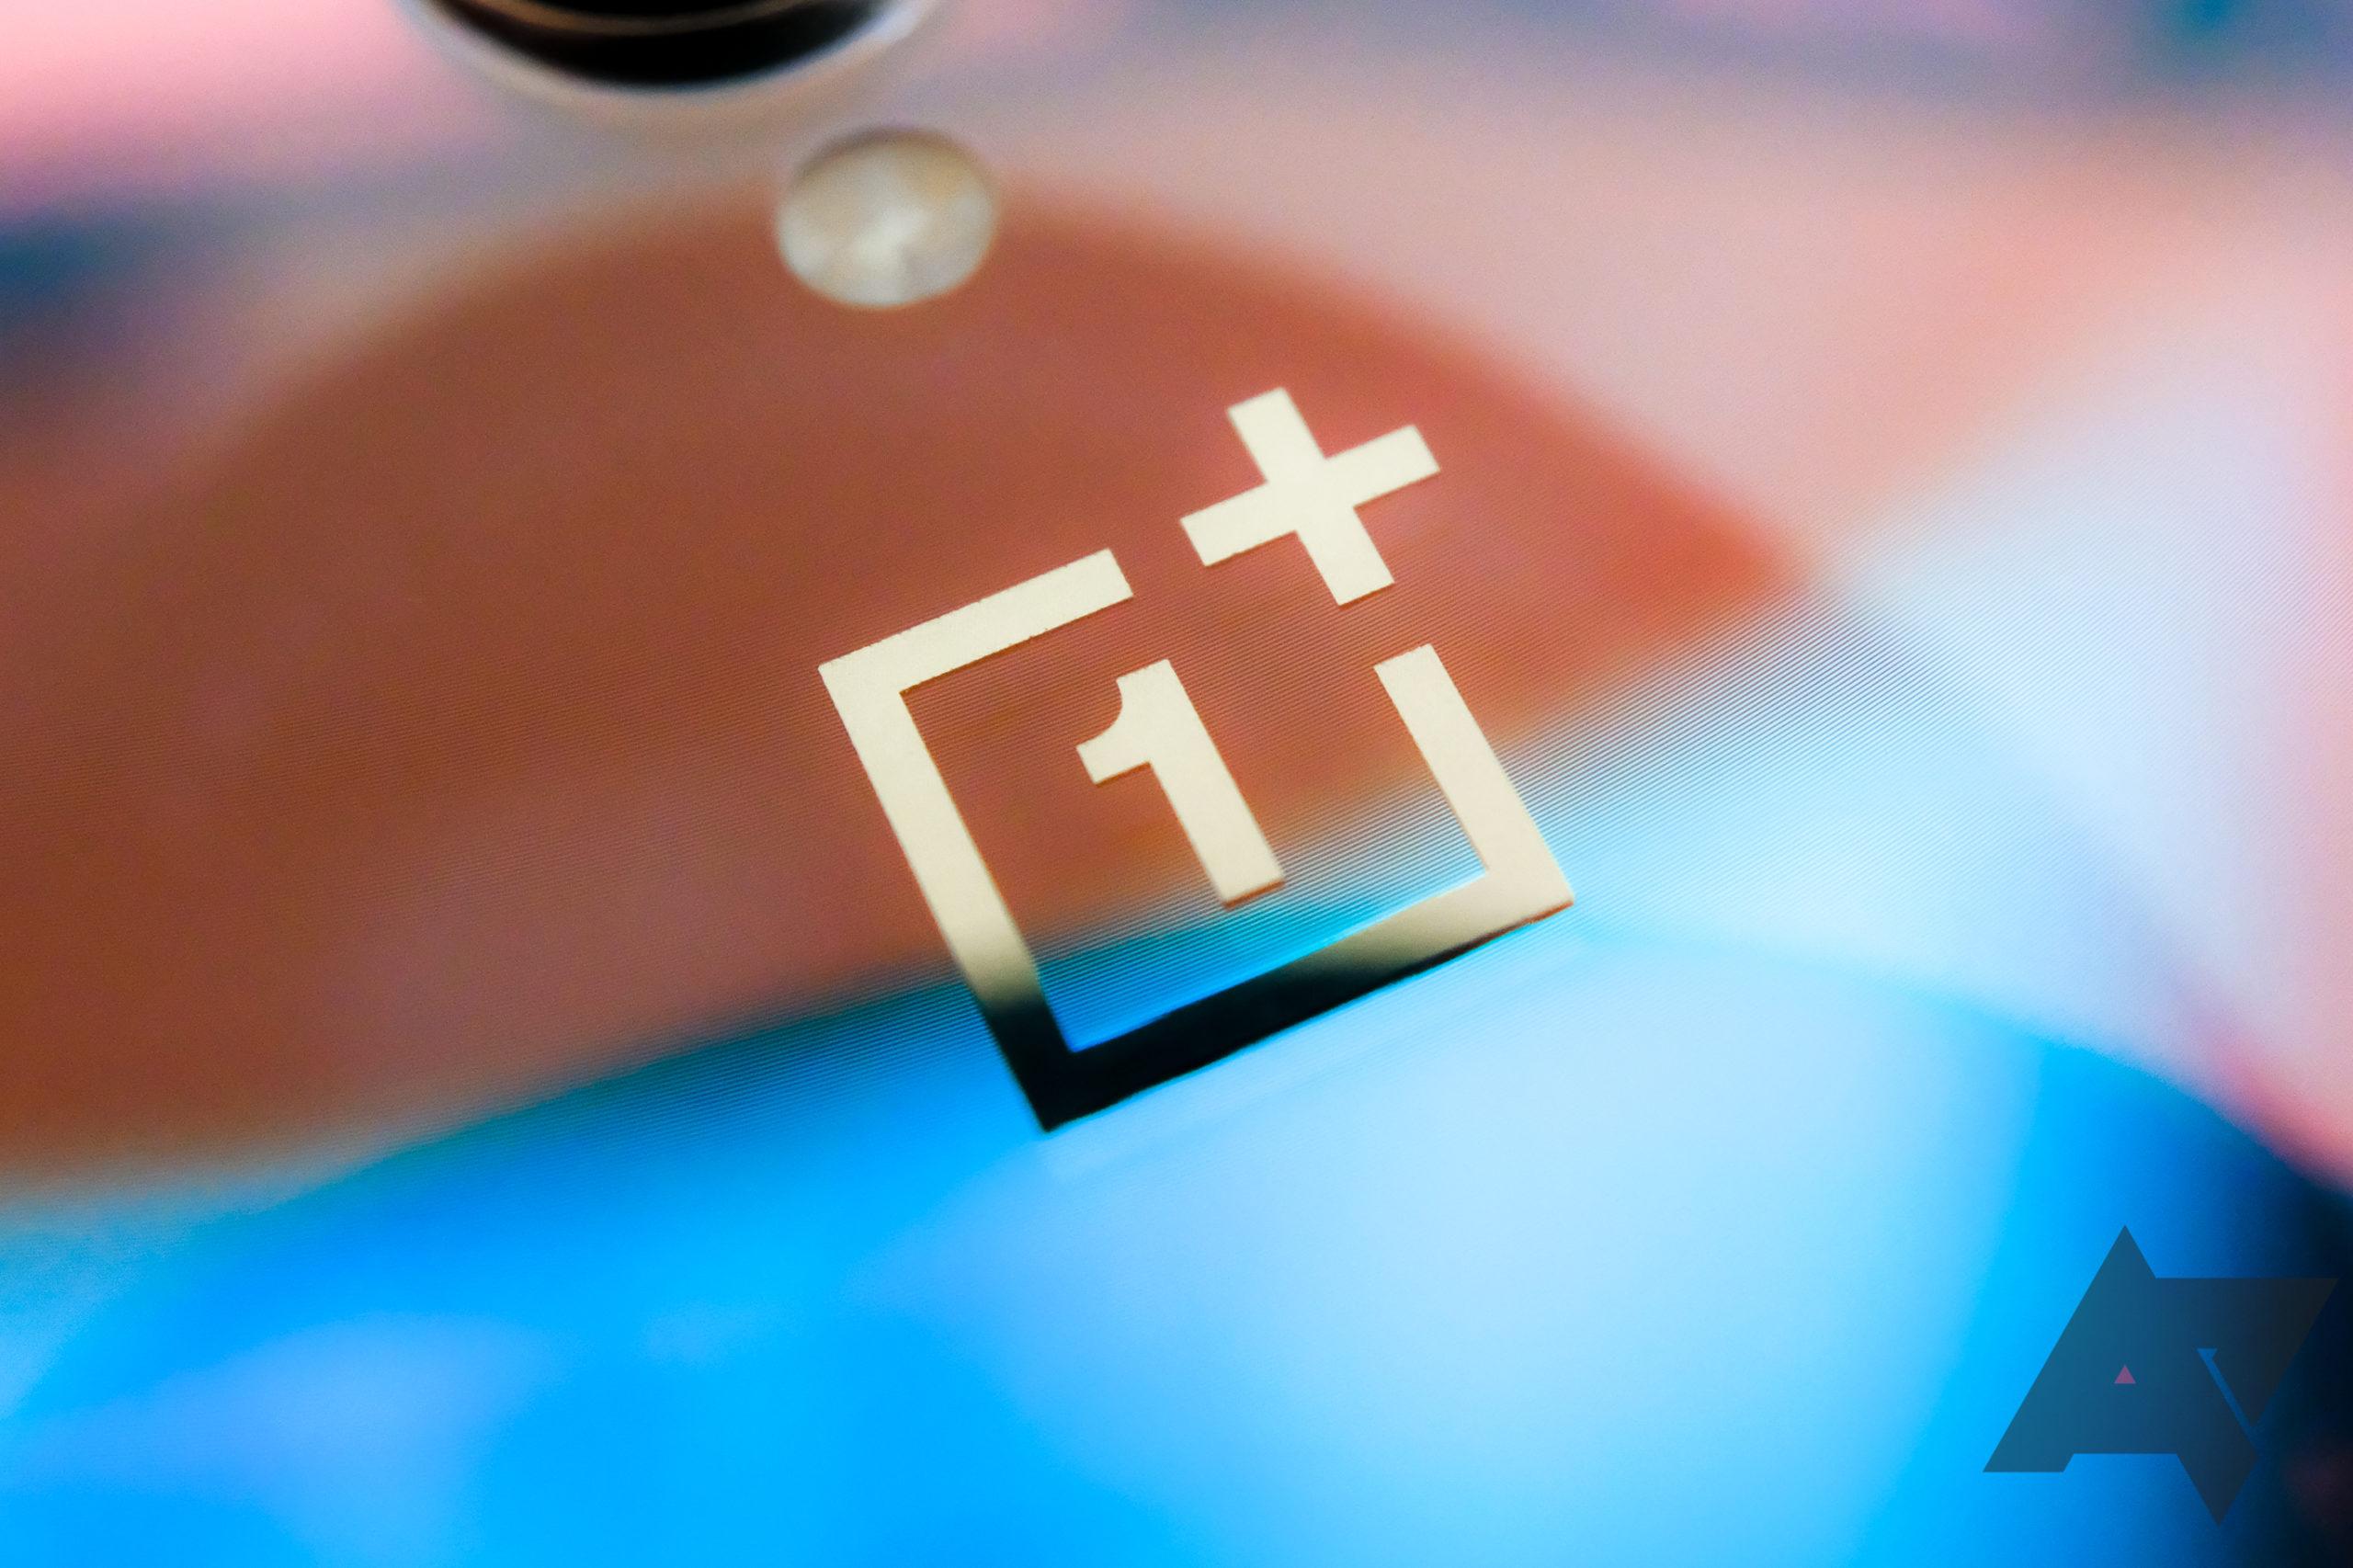 OnePlus Nord 2 renders surfaced online